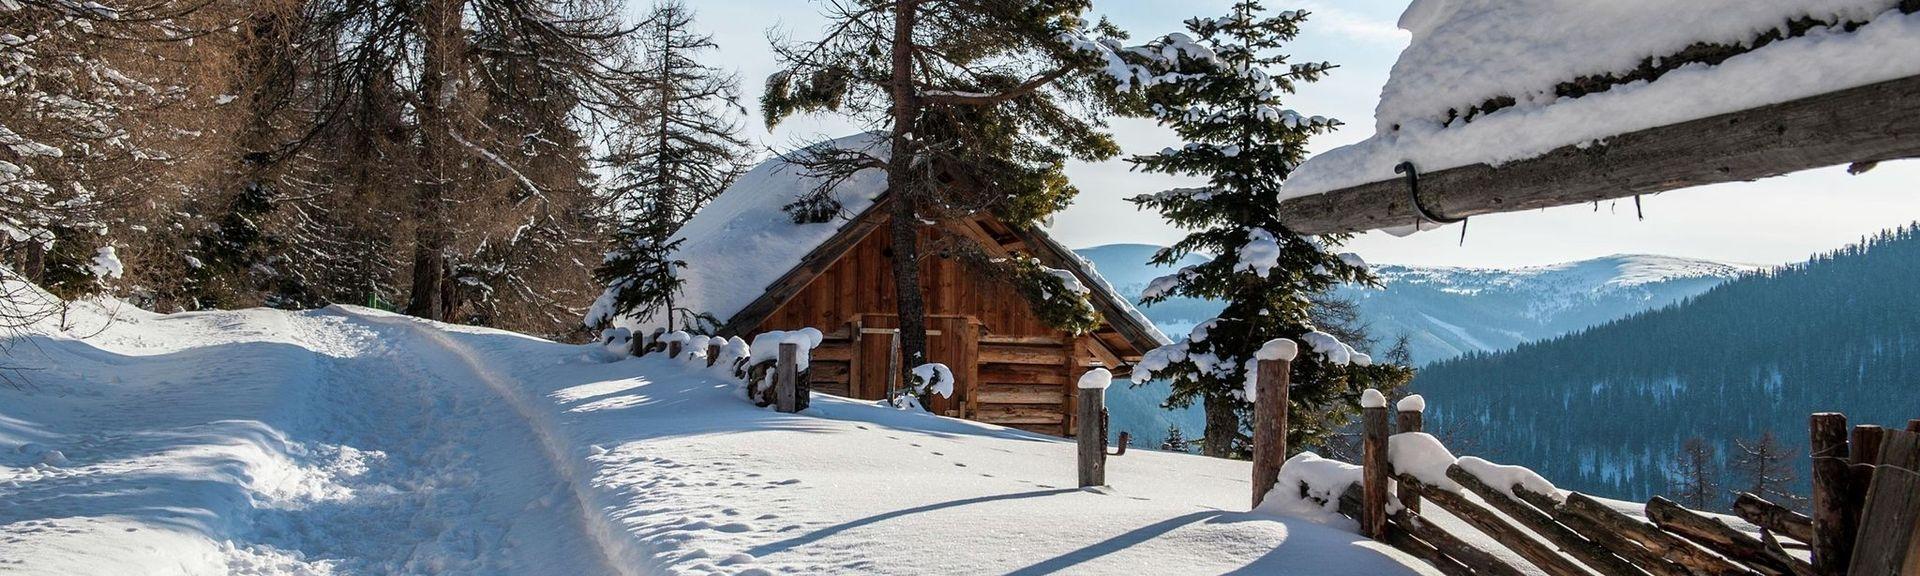 Sankt Georgen ob Murau, Austria